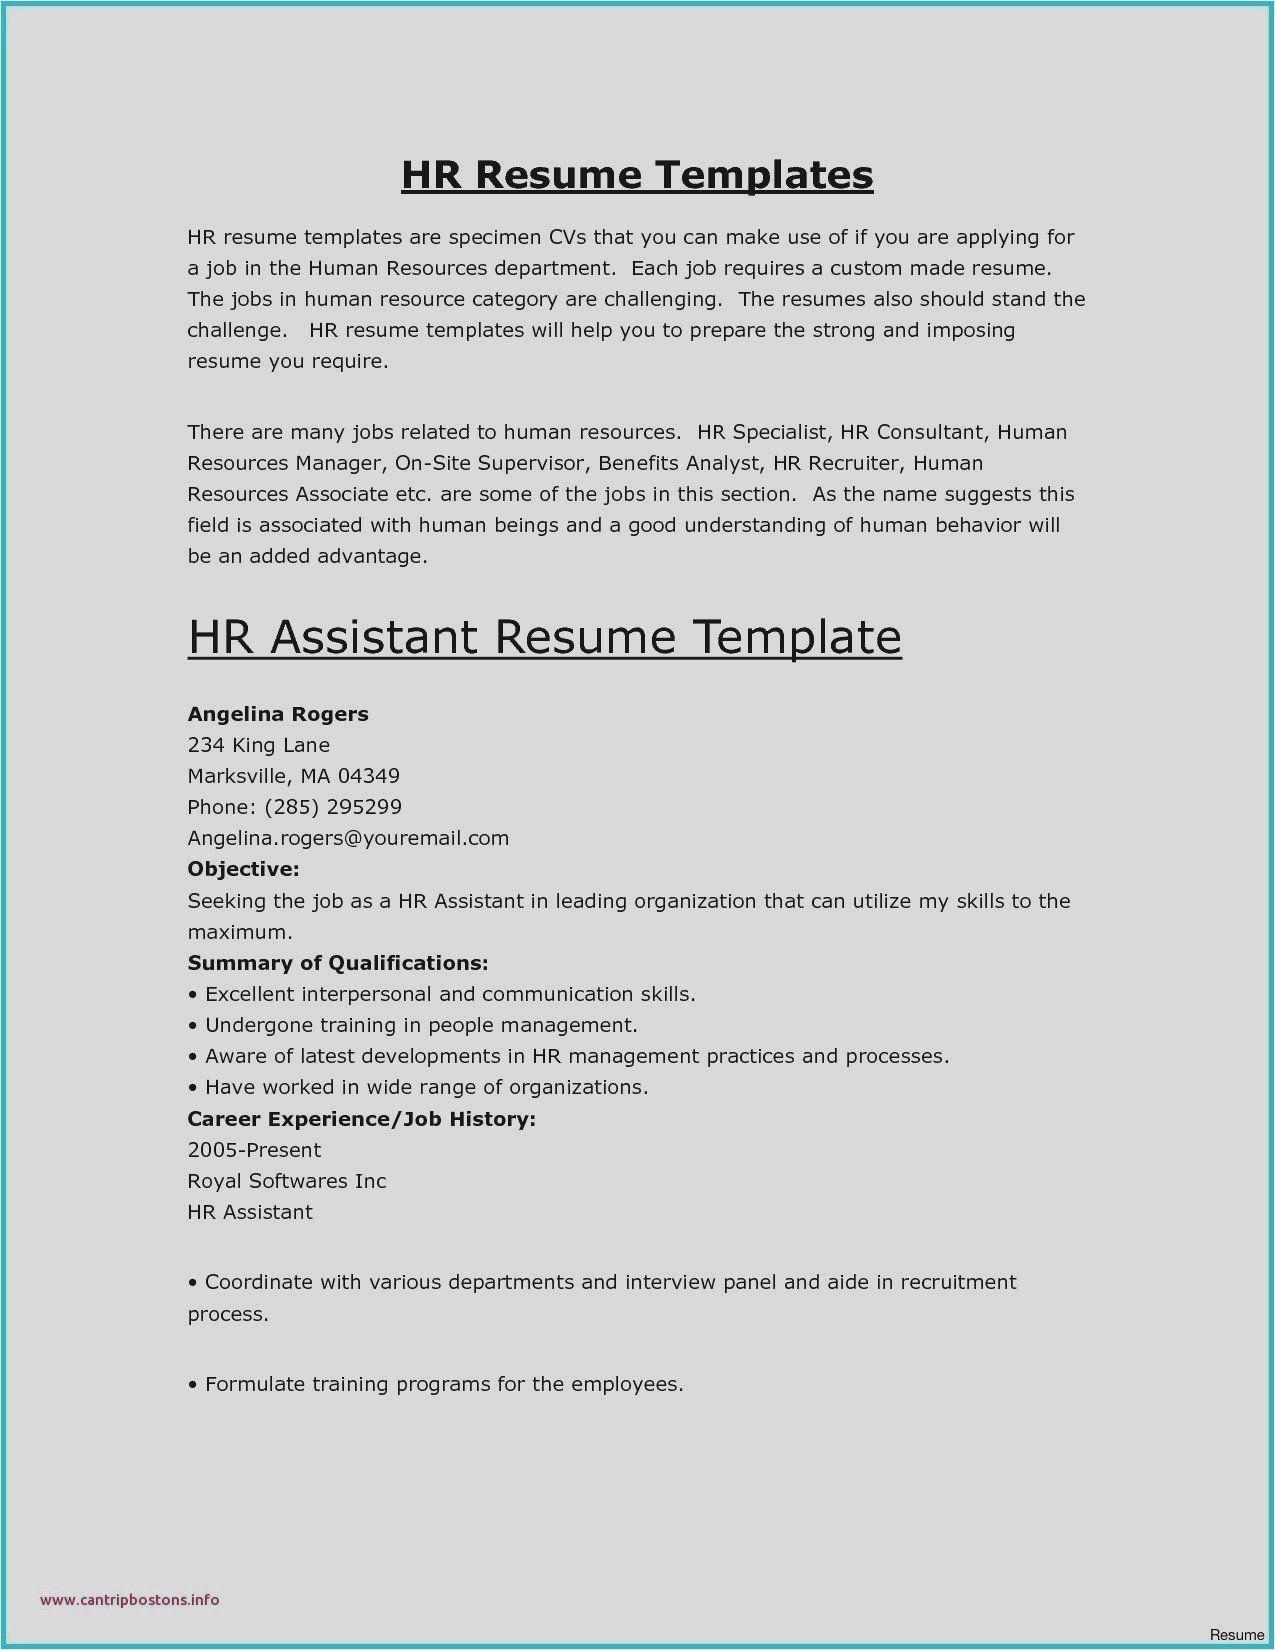 Computer Technician Resume Skills Lovely Puter Technician Resume Sample Pdf New Curriculum Vitae Resume Skills Hr Resume Job Resume Format